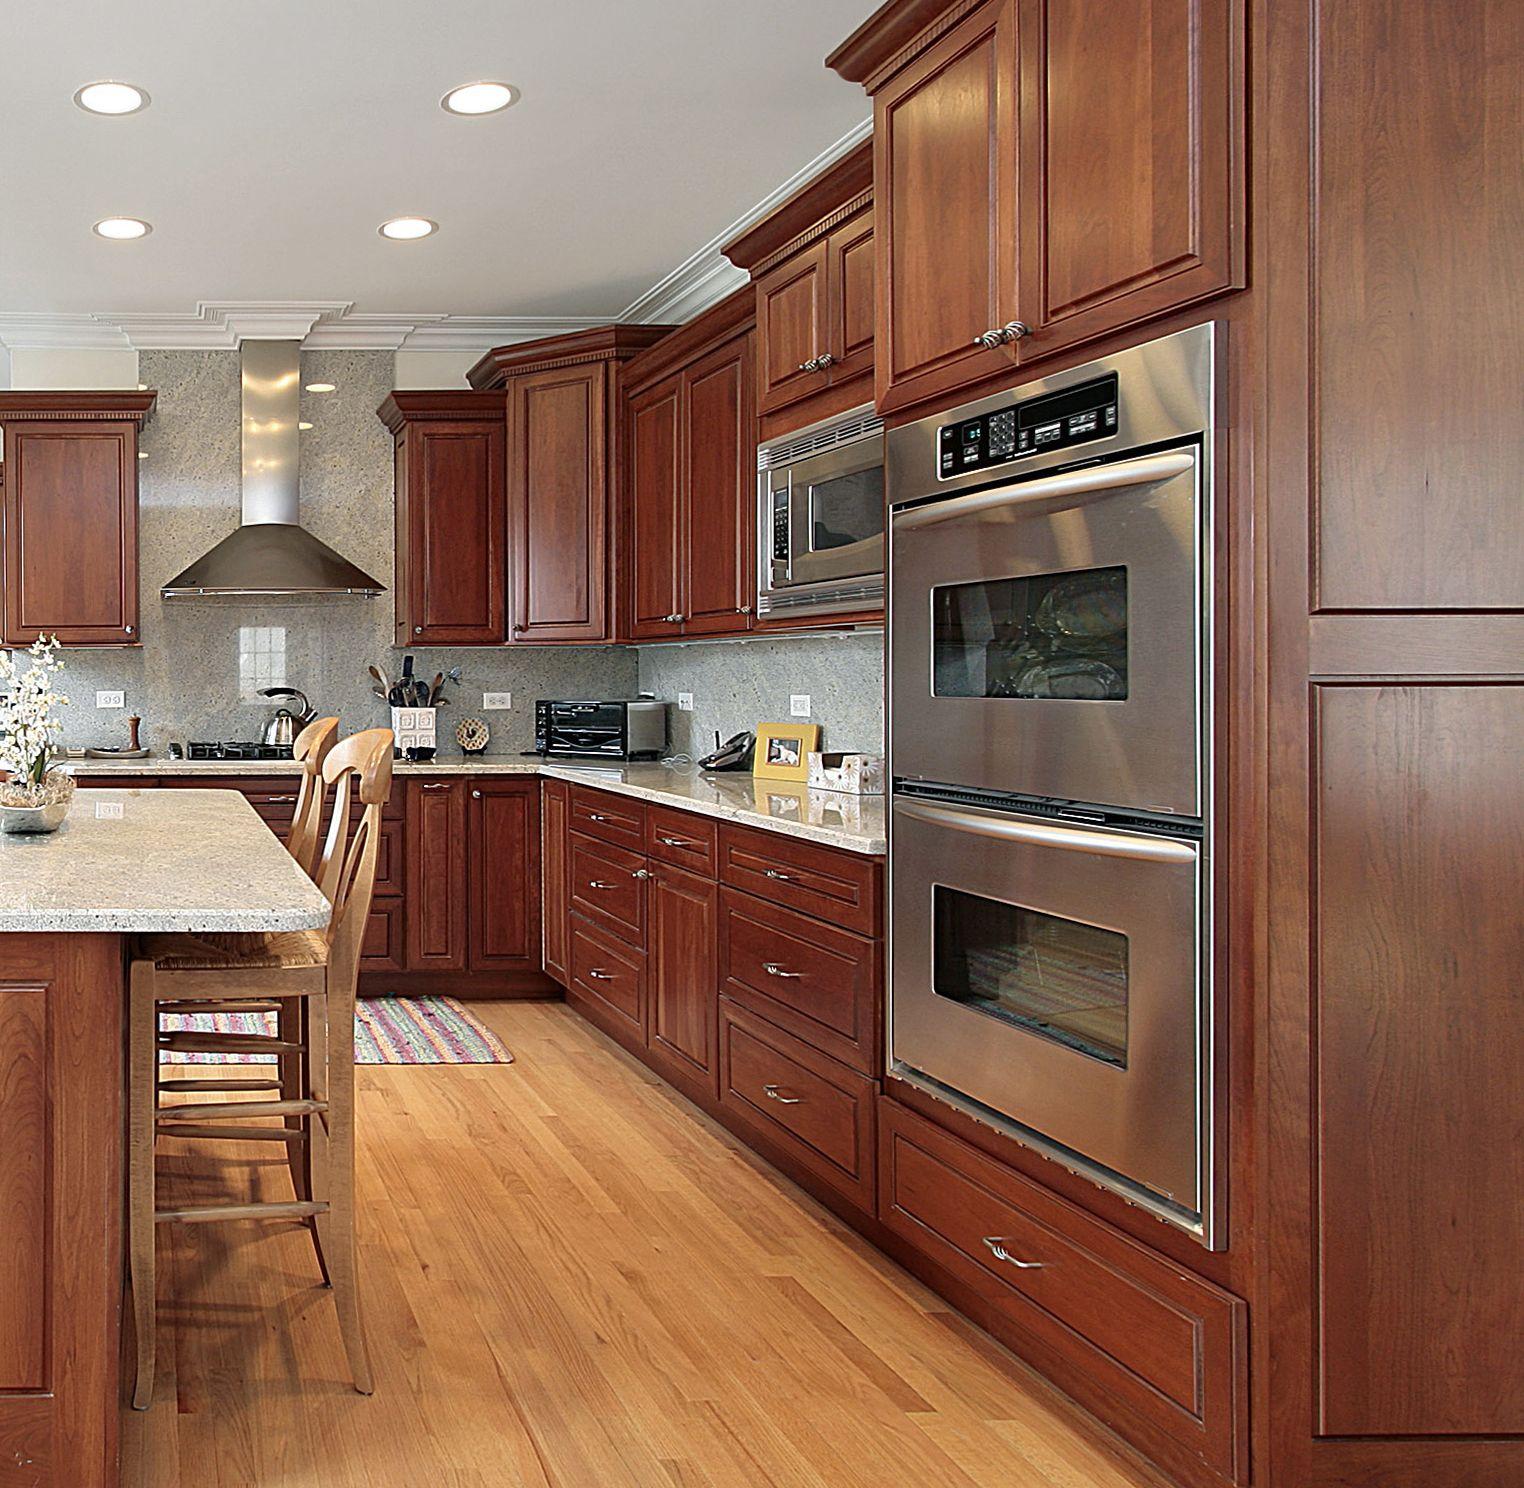 Prasada Kitchens And Fine Cabinetry: Classic Raised Panel Cherry Kitchen. Www.prasadakitchens